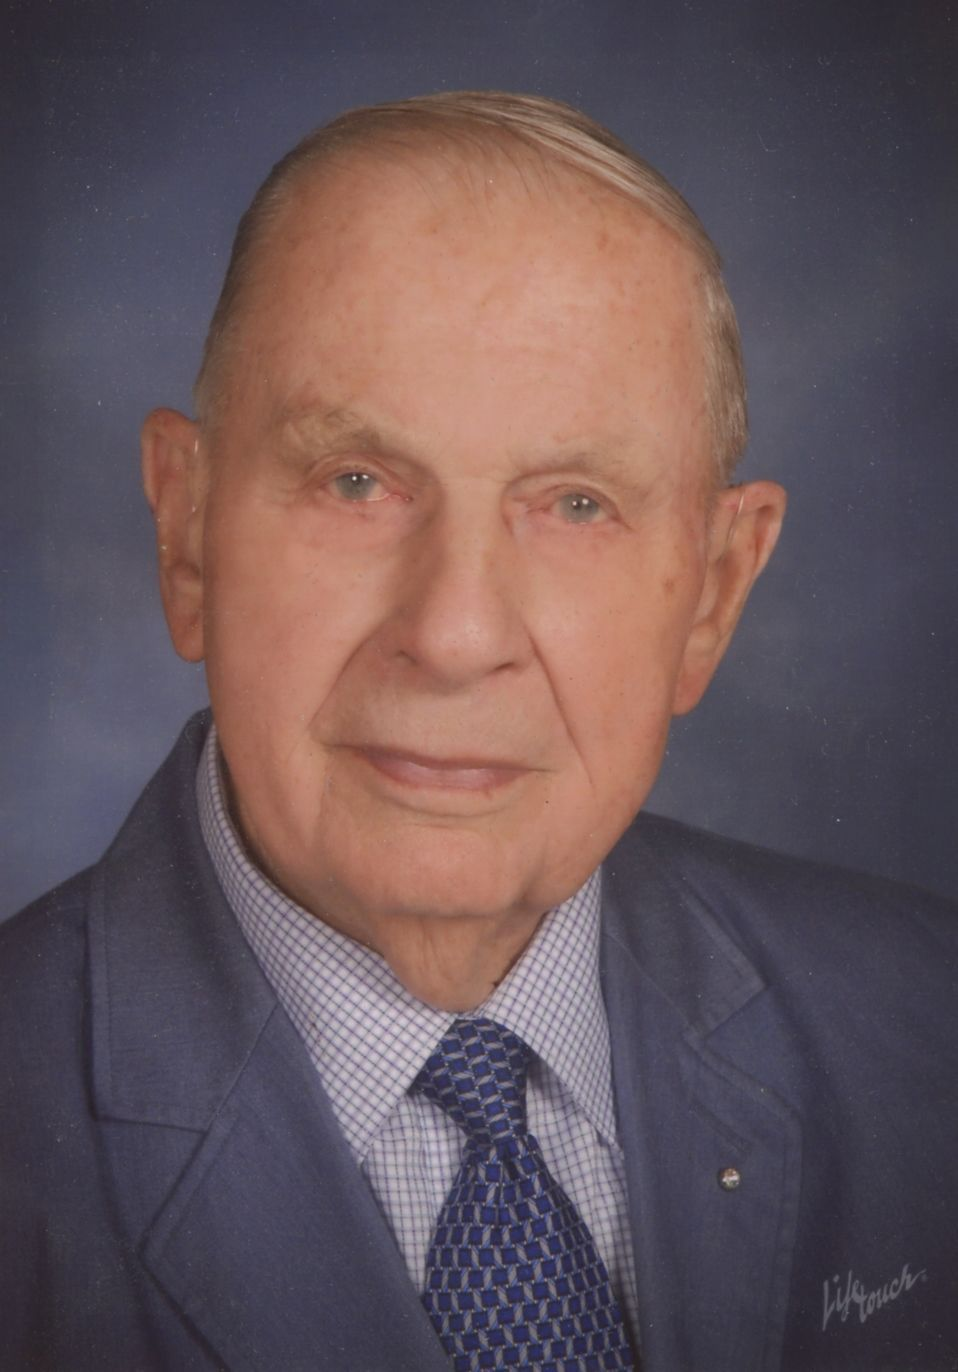 Daniel J. Naert